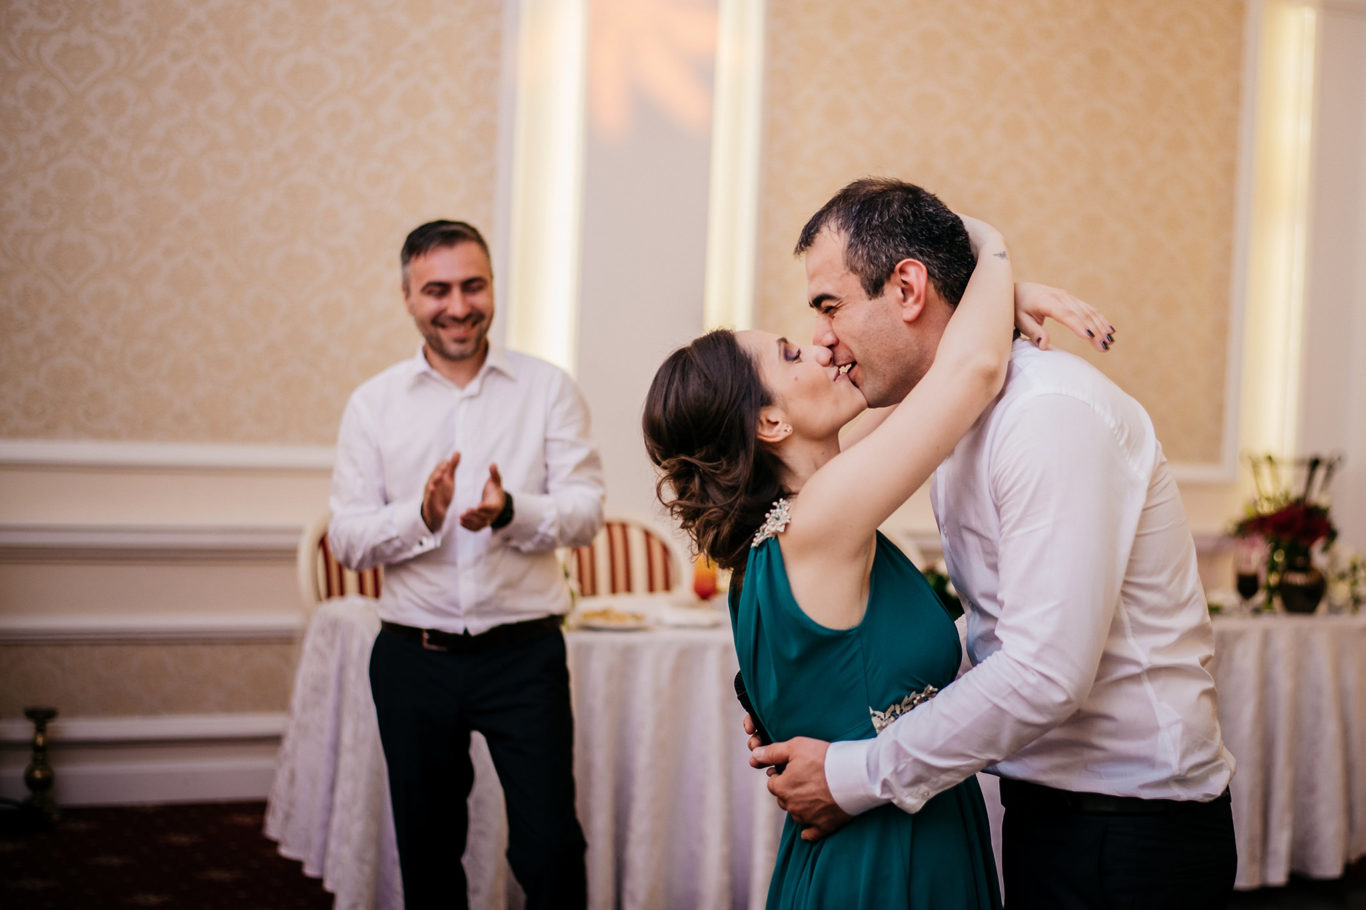 0743-fotografie-nunta-bucuresti-anca-george-fotograf-ciprian-dumitrescu-dsc_9689